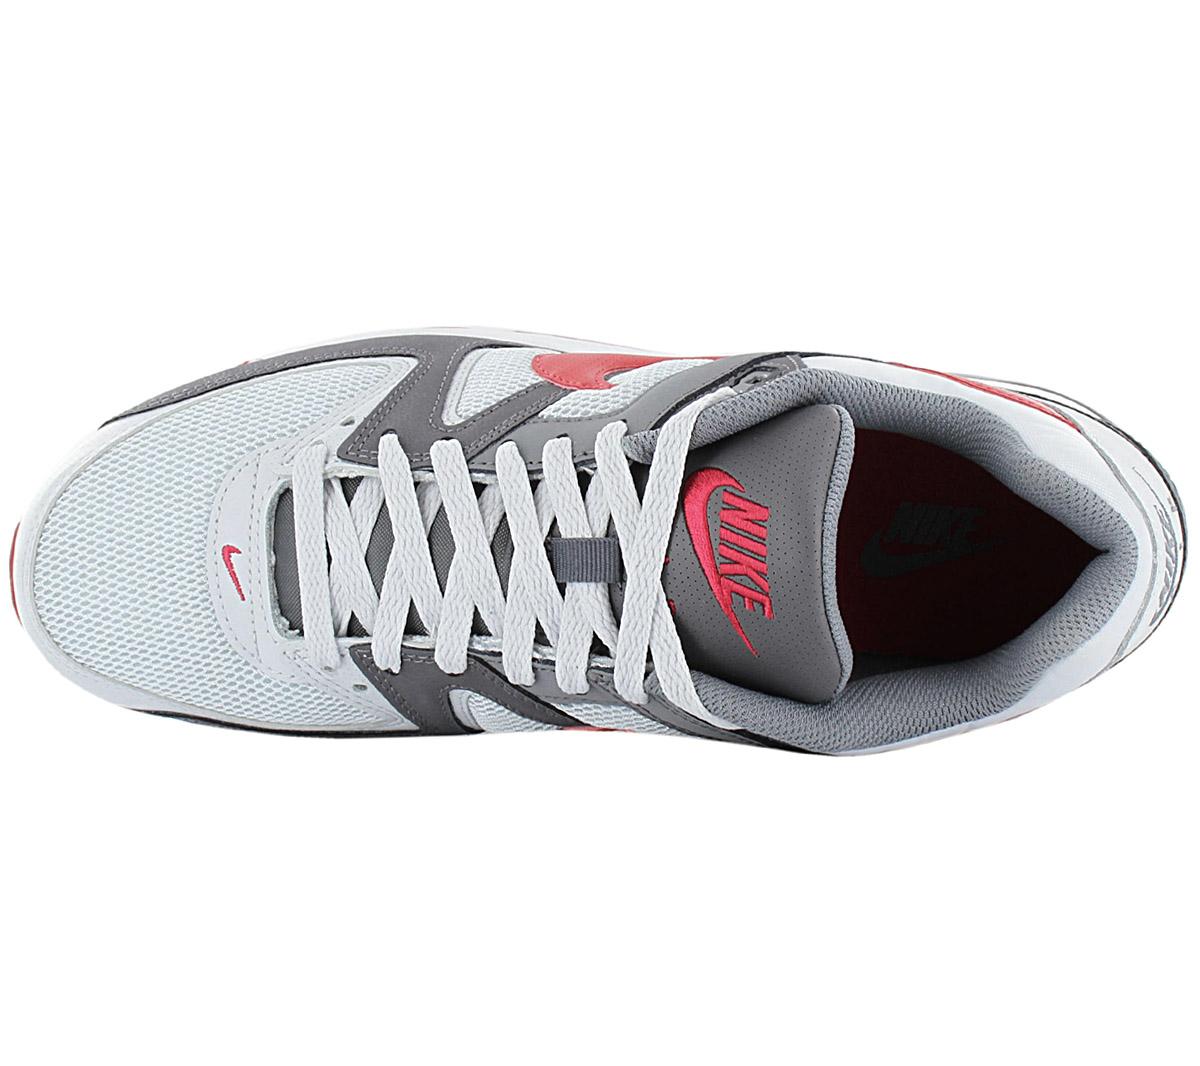 Sneaker Nike Air Max Command Classic Sportschuhe LTD Turnschuh 629993-049